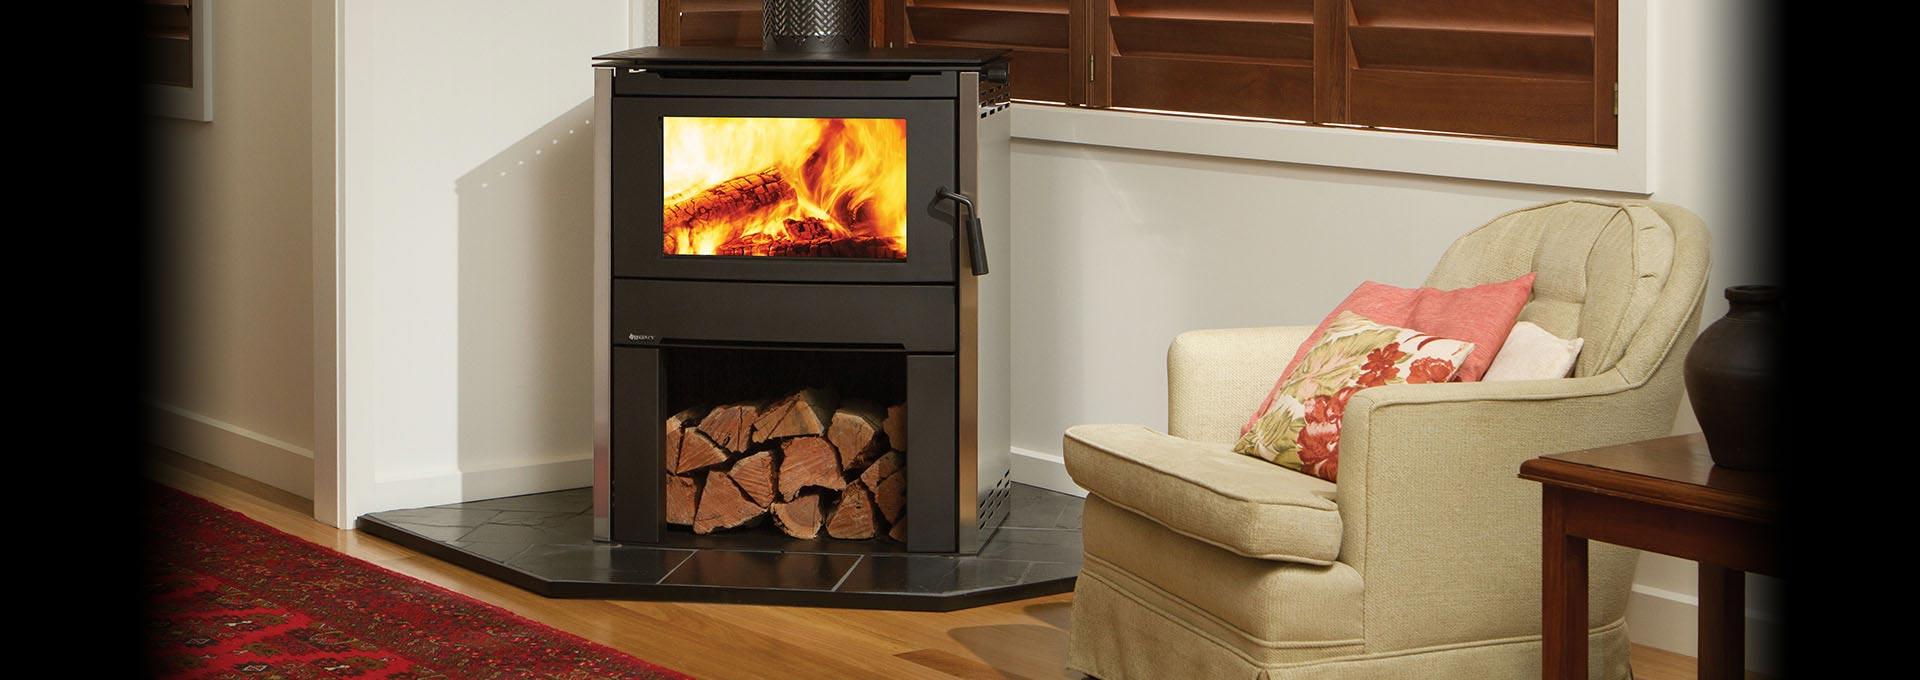 Modern Wood Freestanding Alterra Regency Fireplace Products